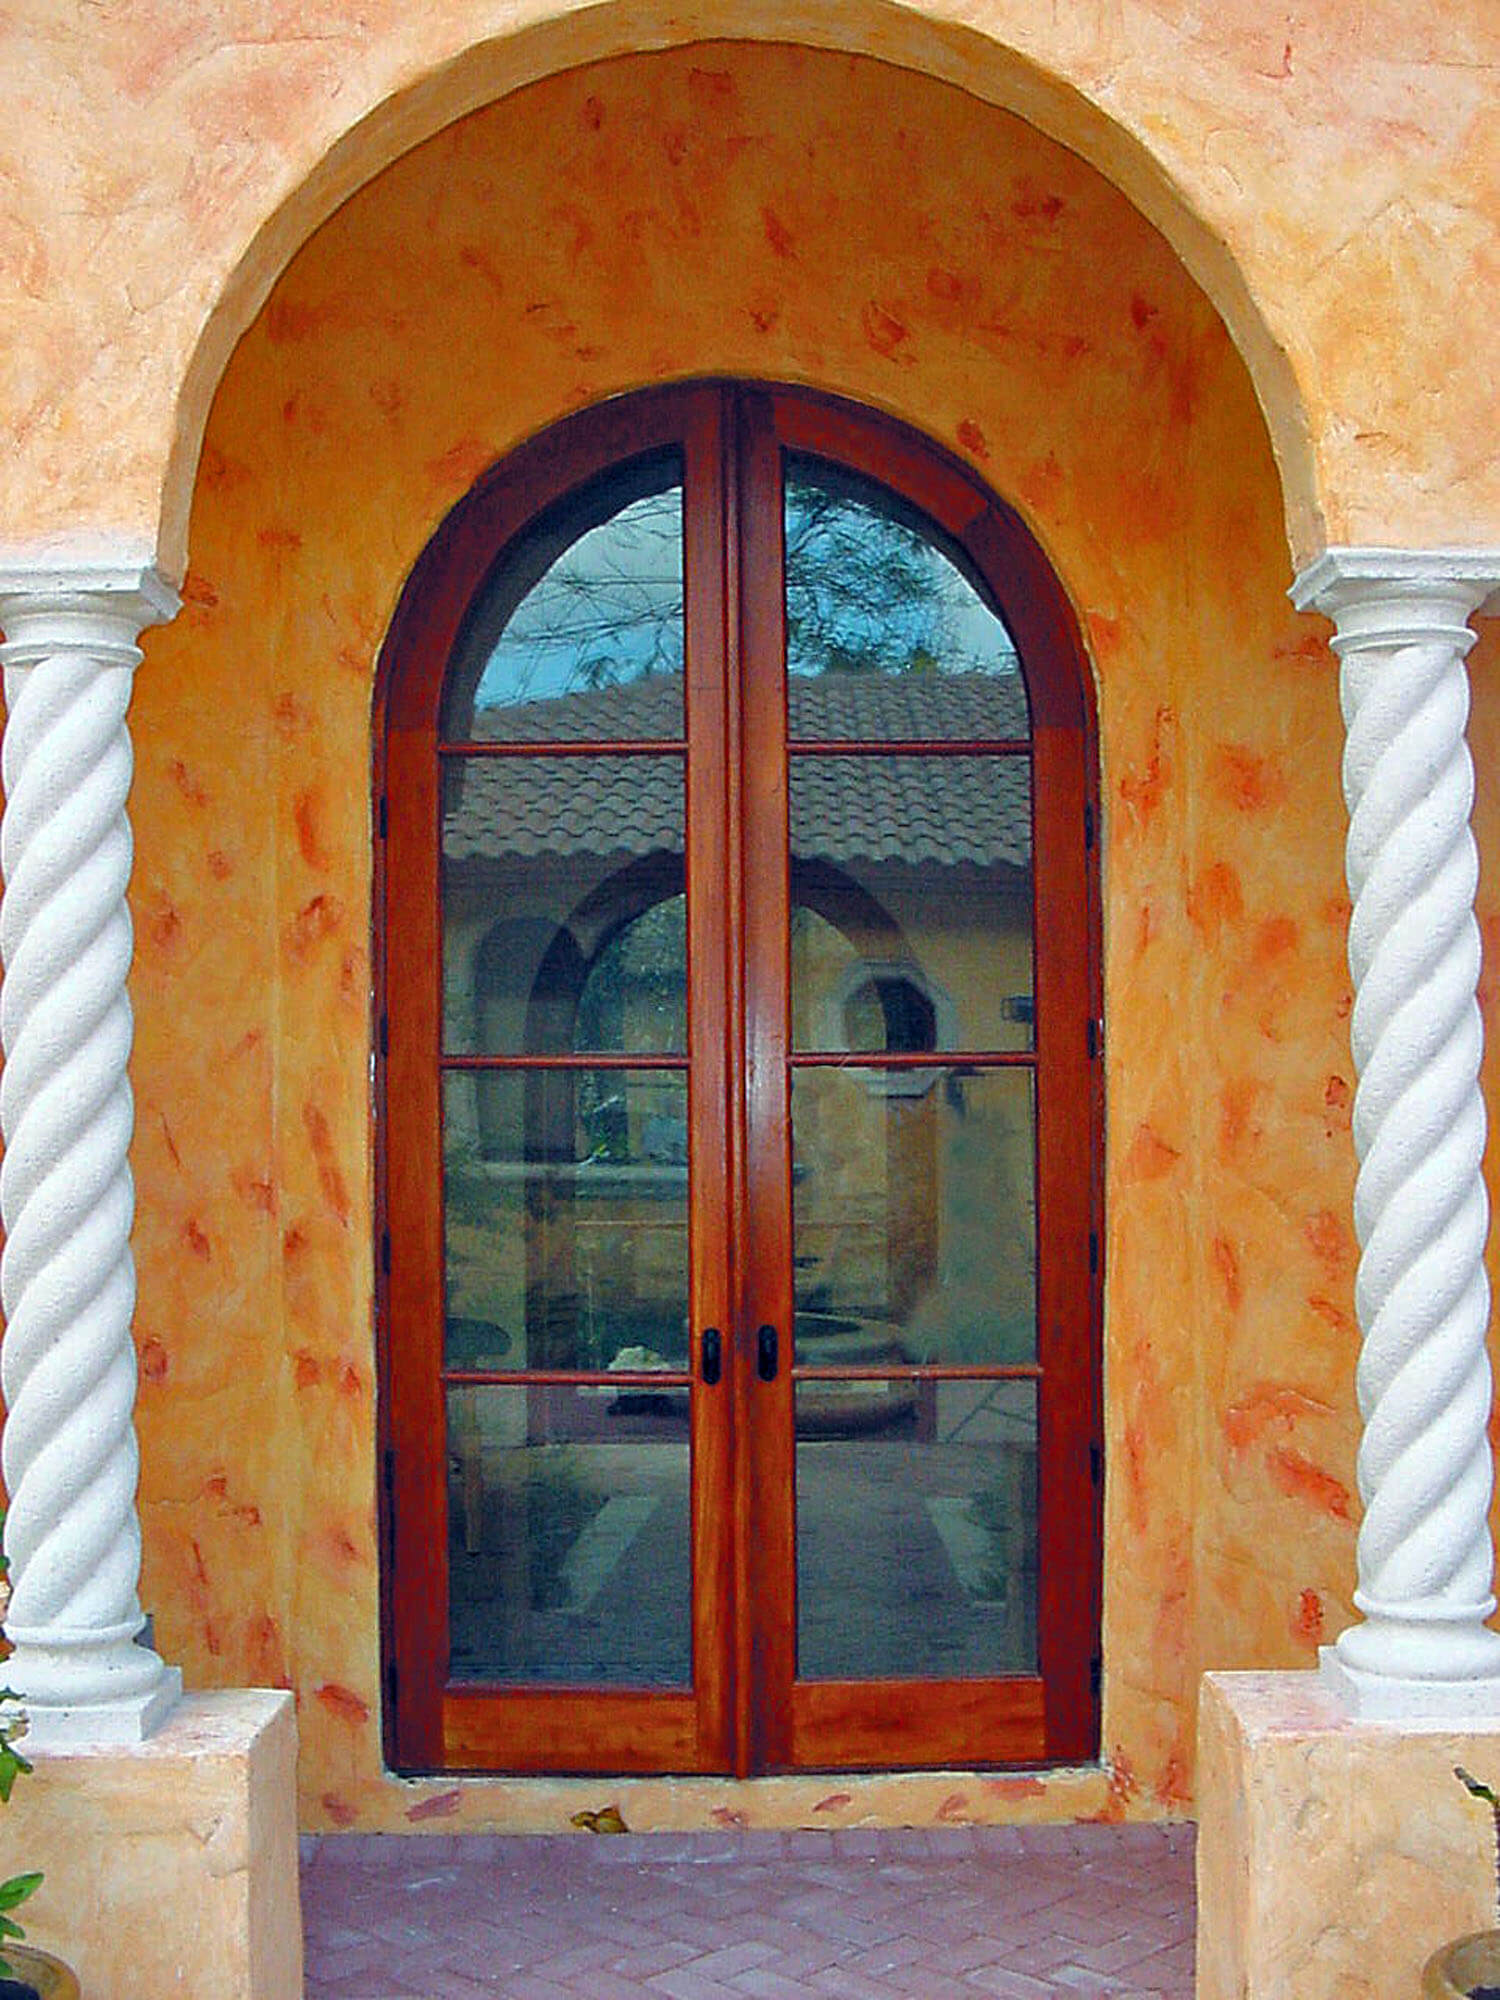 NEW MEXICO MAHOGANY PATIO ARCHED DOOR.